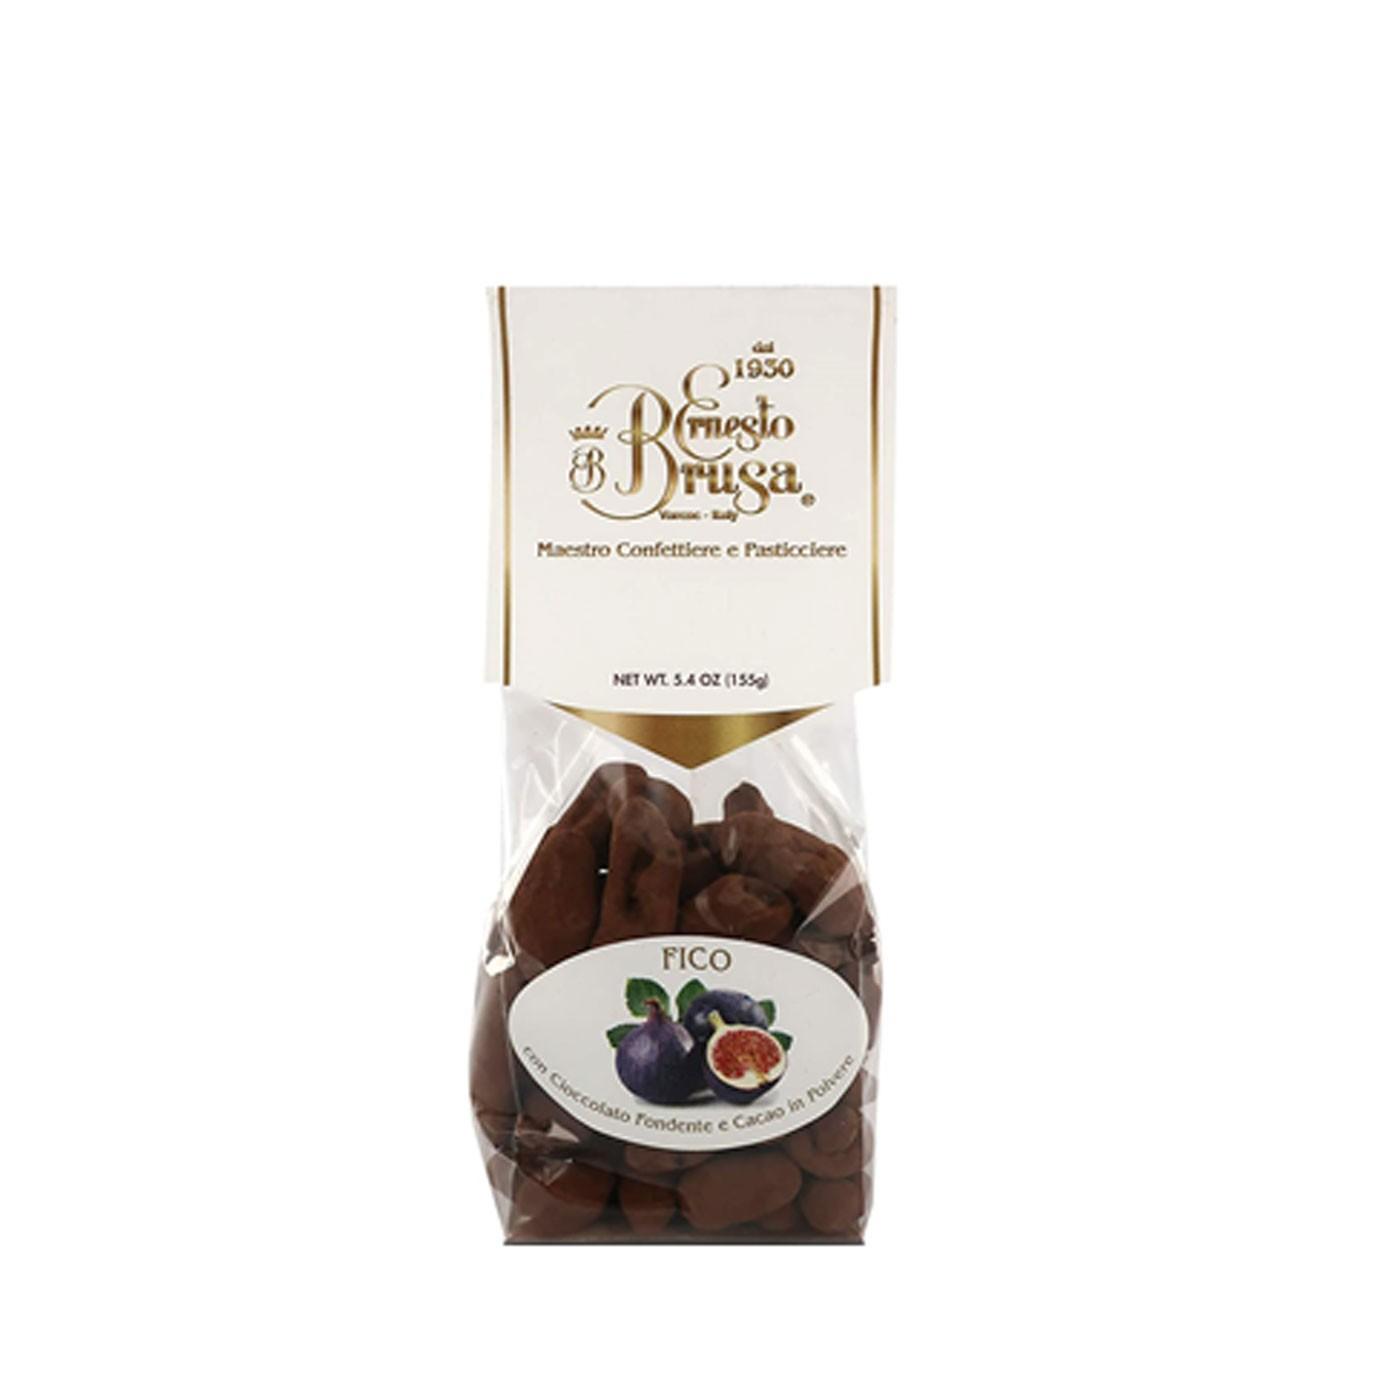 Dark Chocolate Covered Figs 5.4 oz